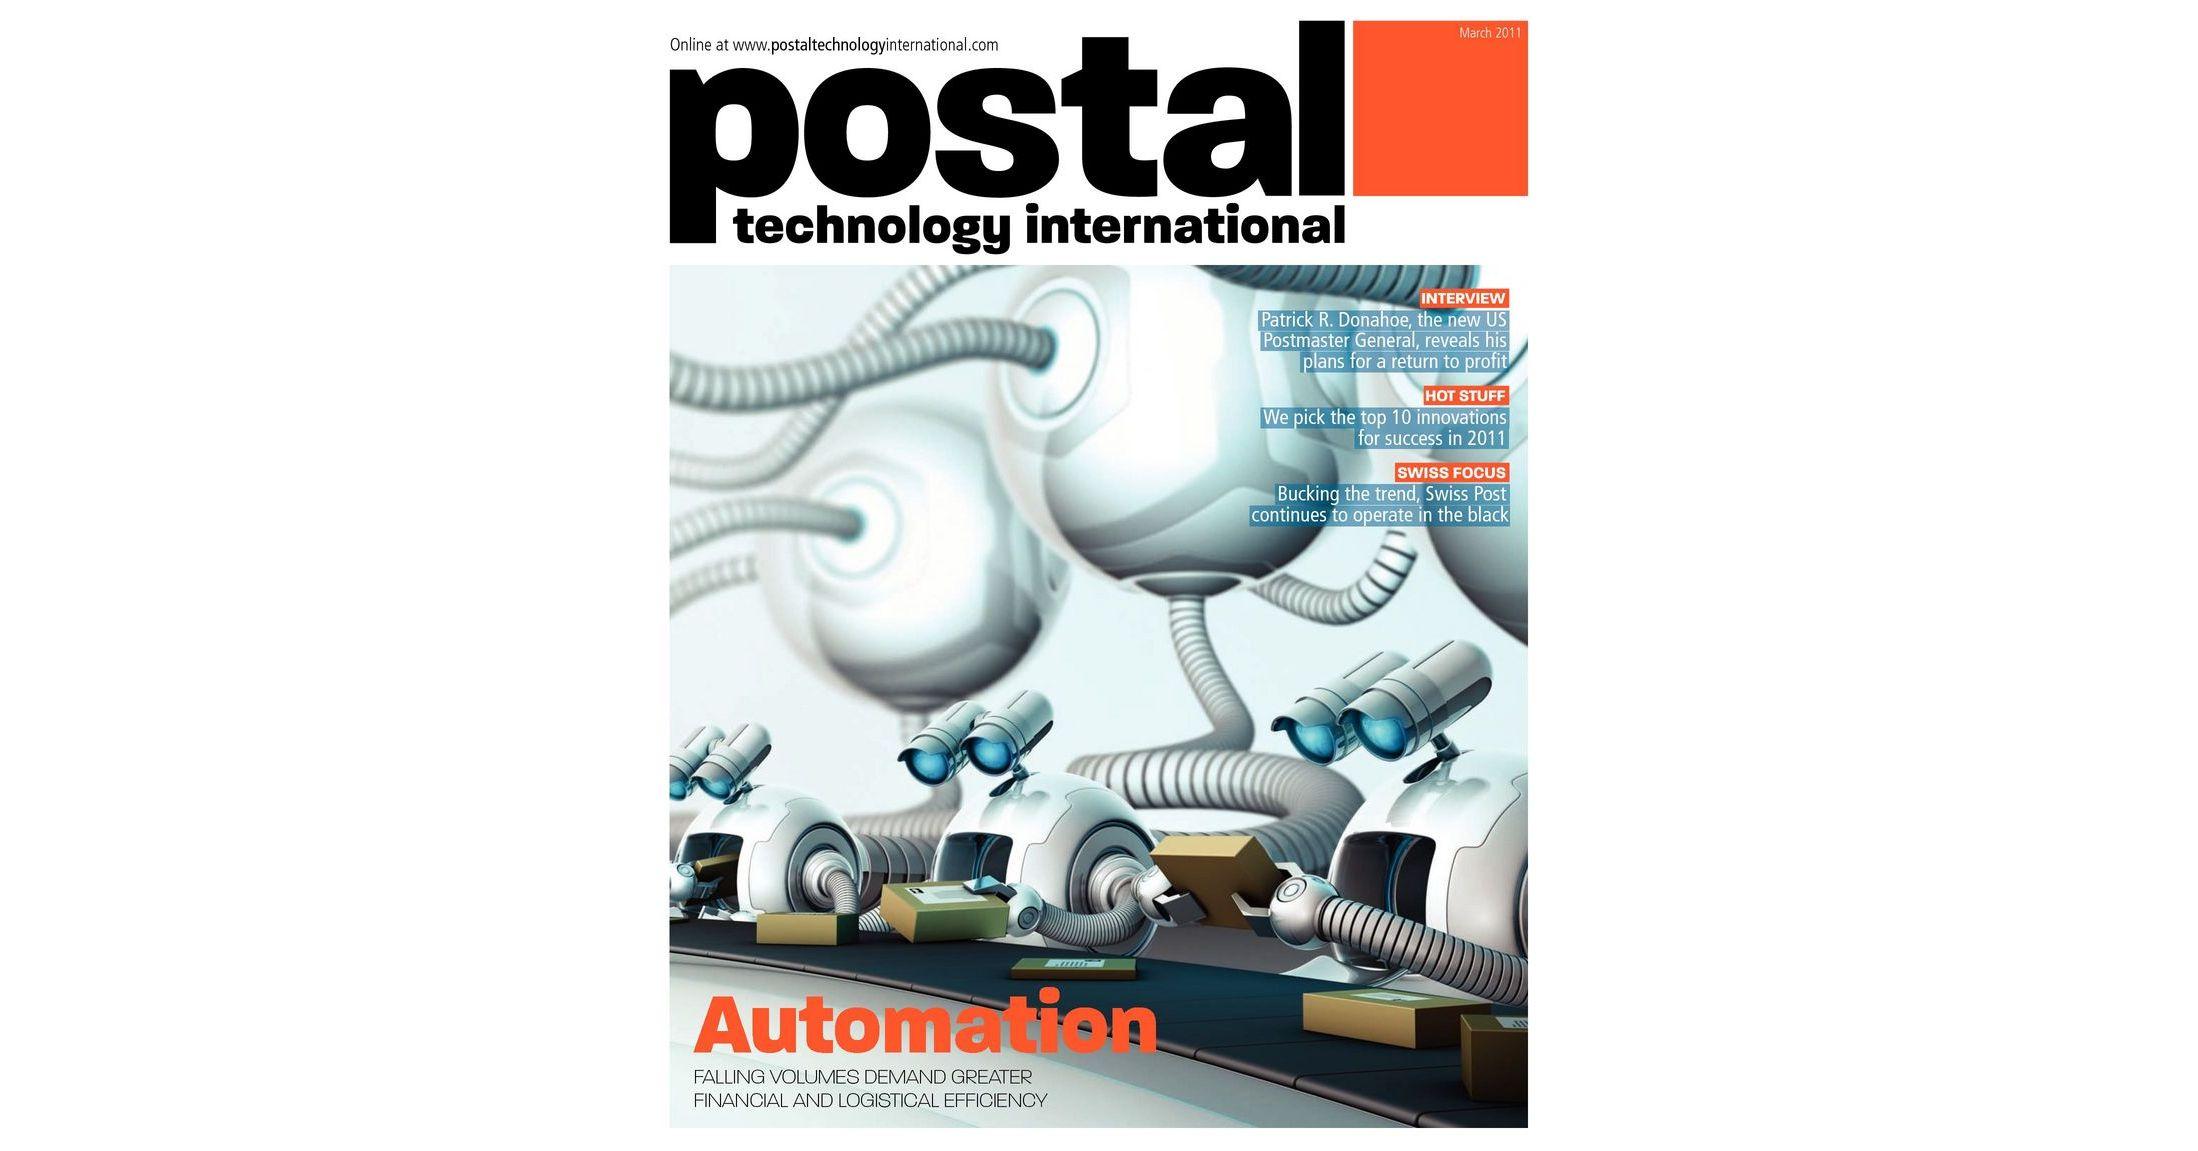 Postal Technology International - March 2011